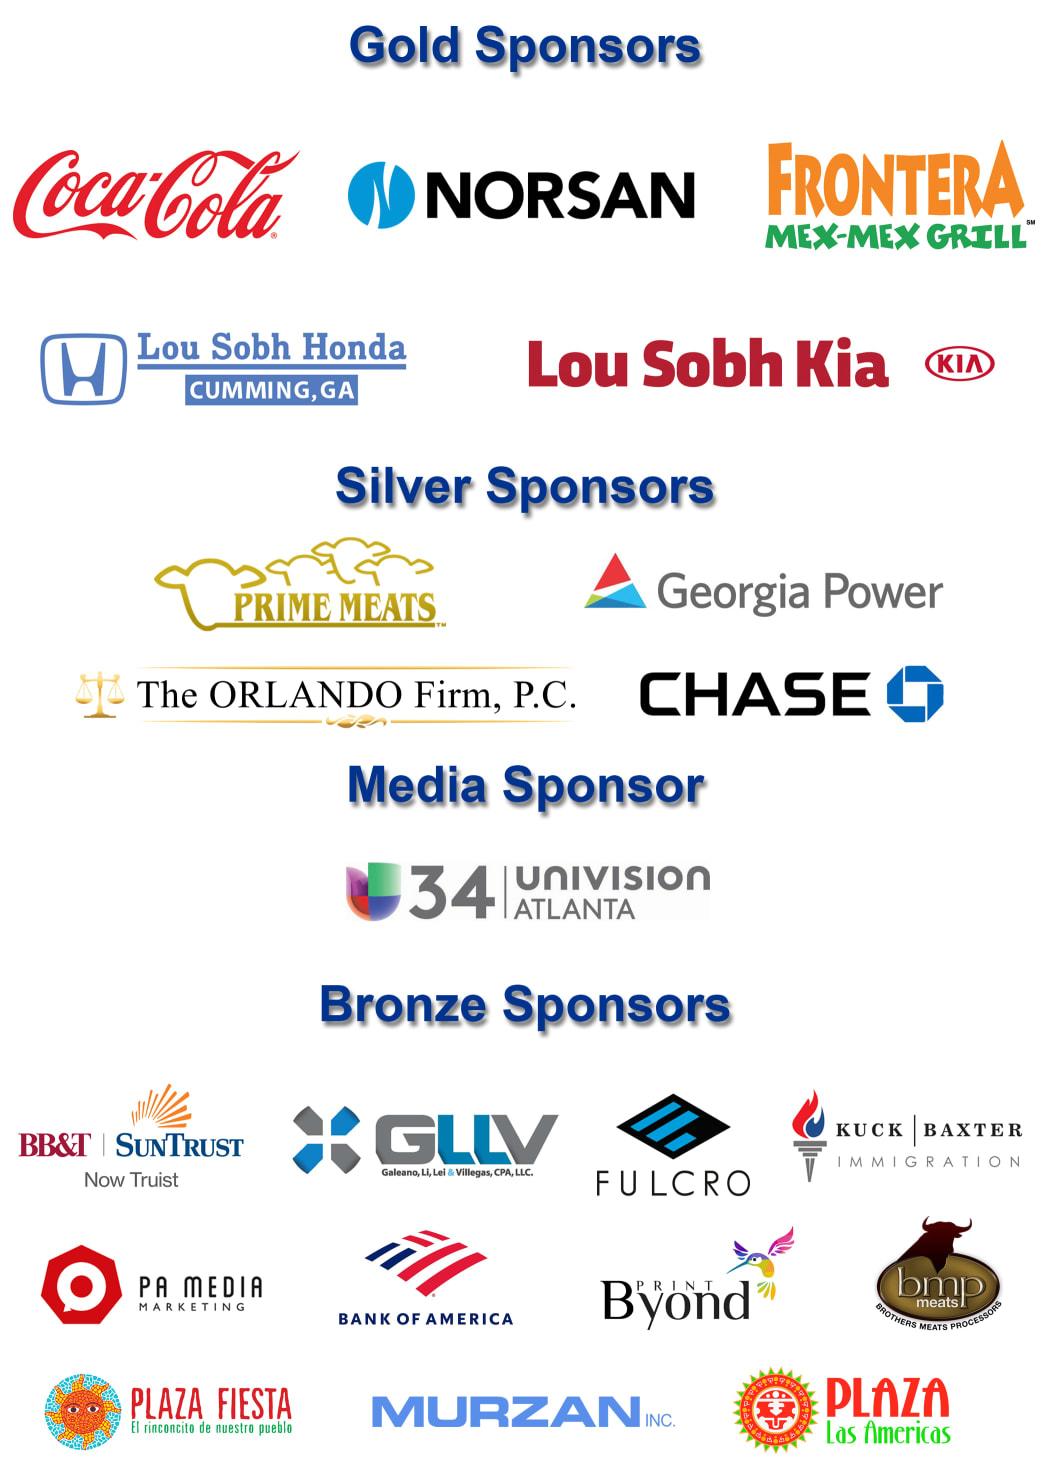 LACC-Posada-2020-Sponsors